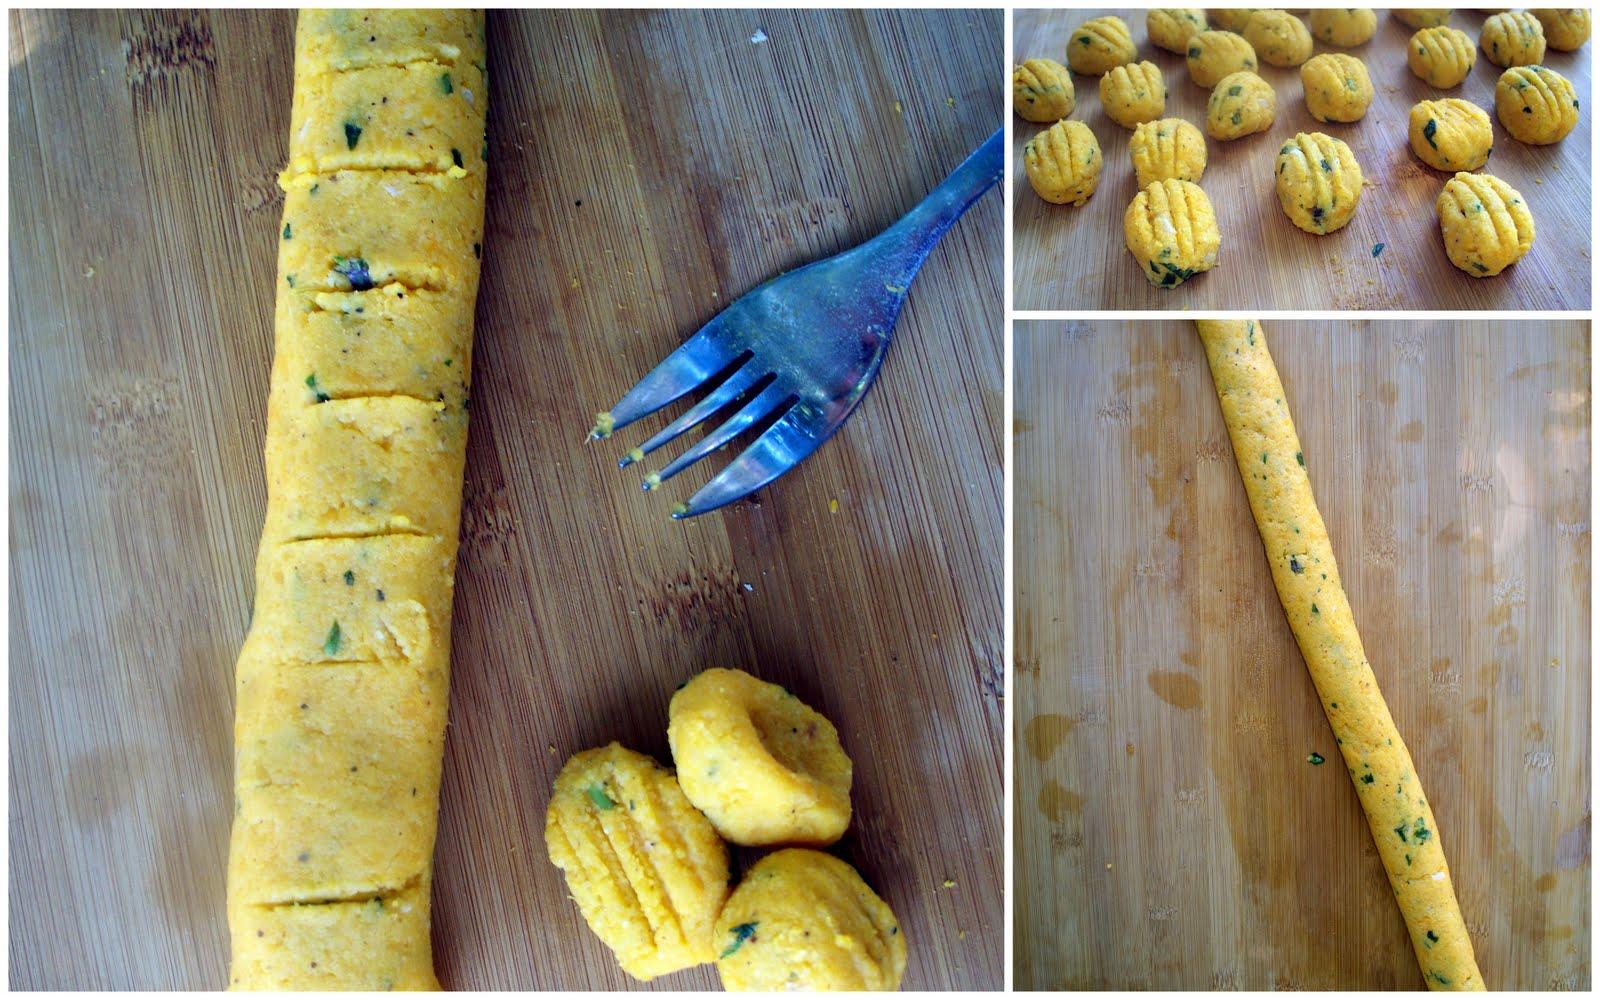 ... :: Baked Rosemary, Almond & Butternut Squash Gnocchi (gluten free